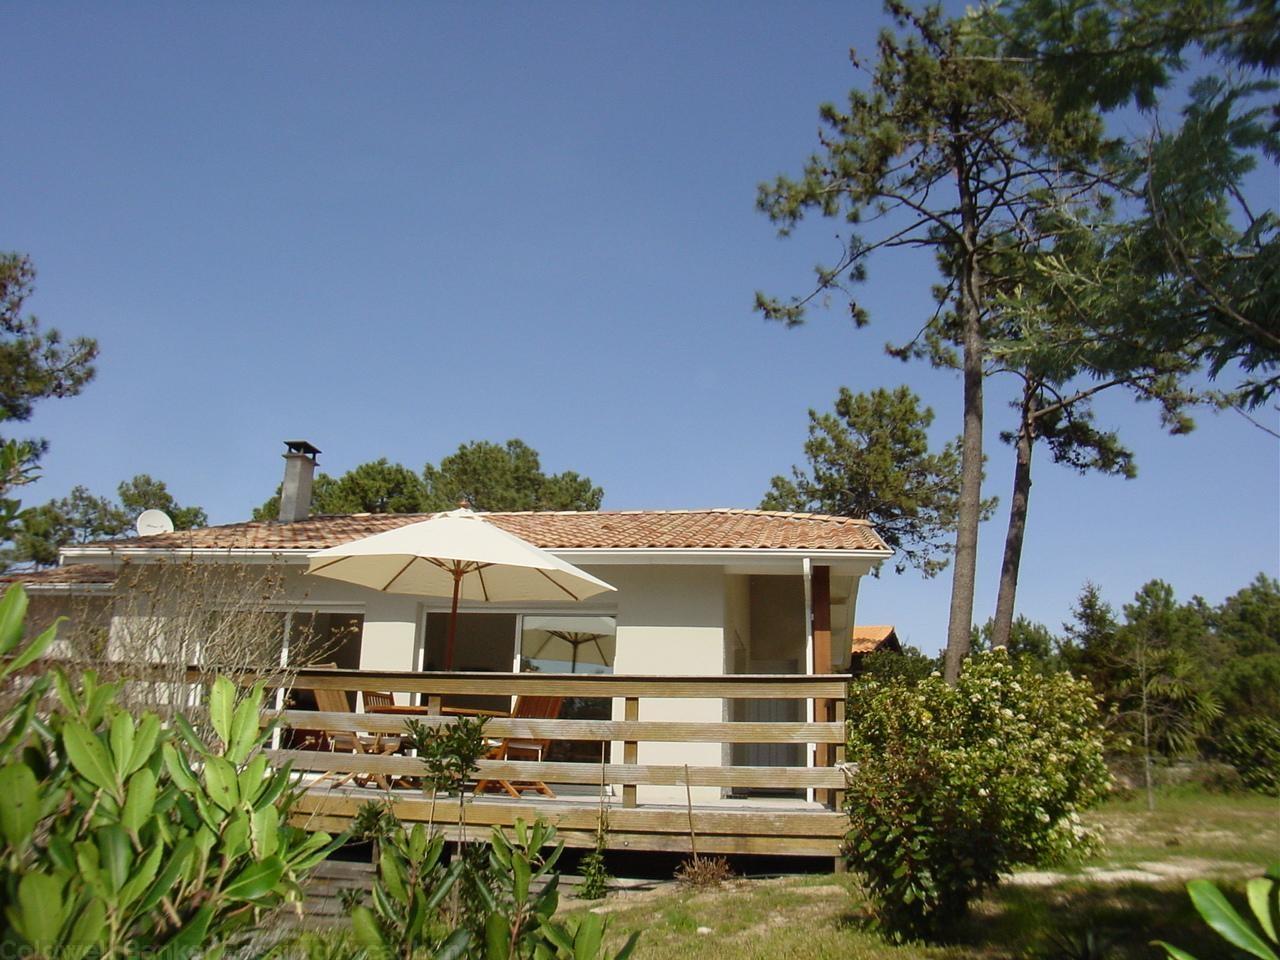 A louer villa 3 chambres 6 couchages proche cap-ferret